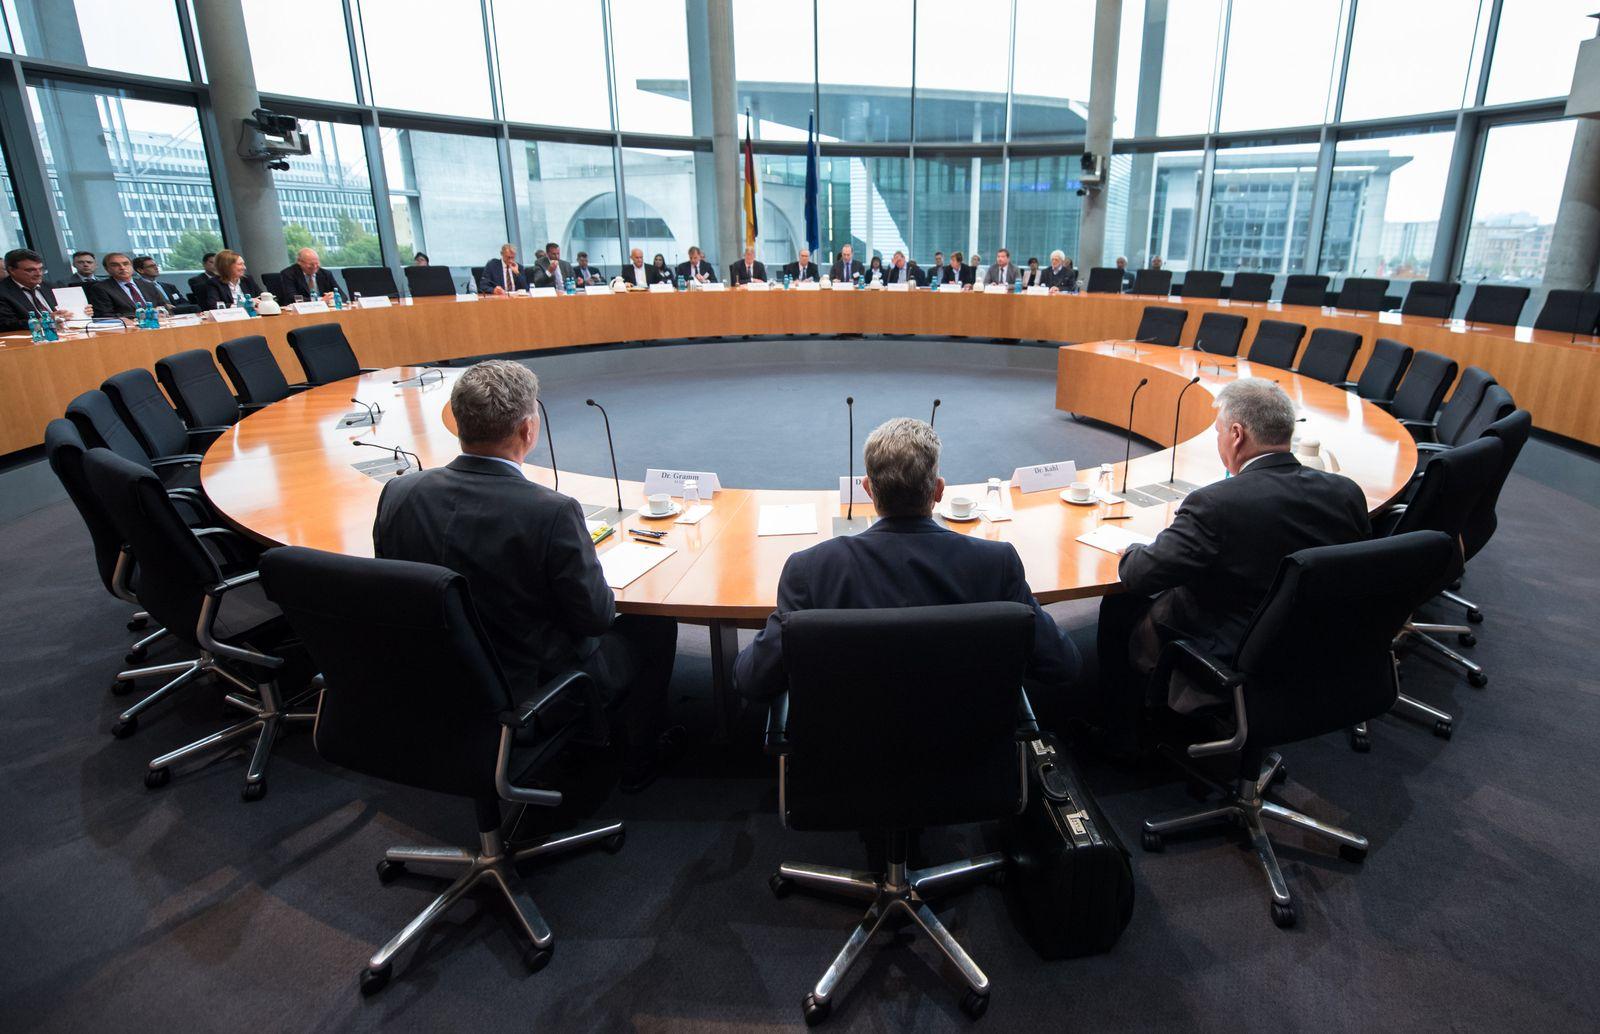 Parlamentarisches Kontrollgremium